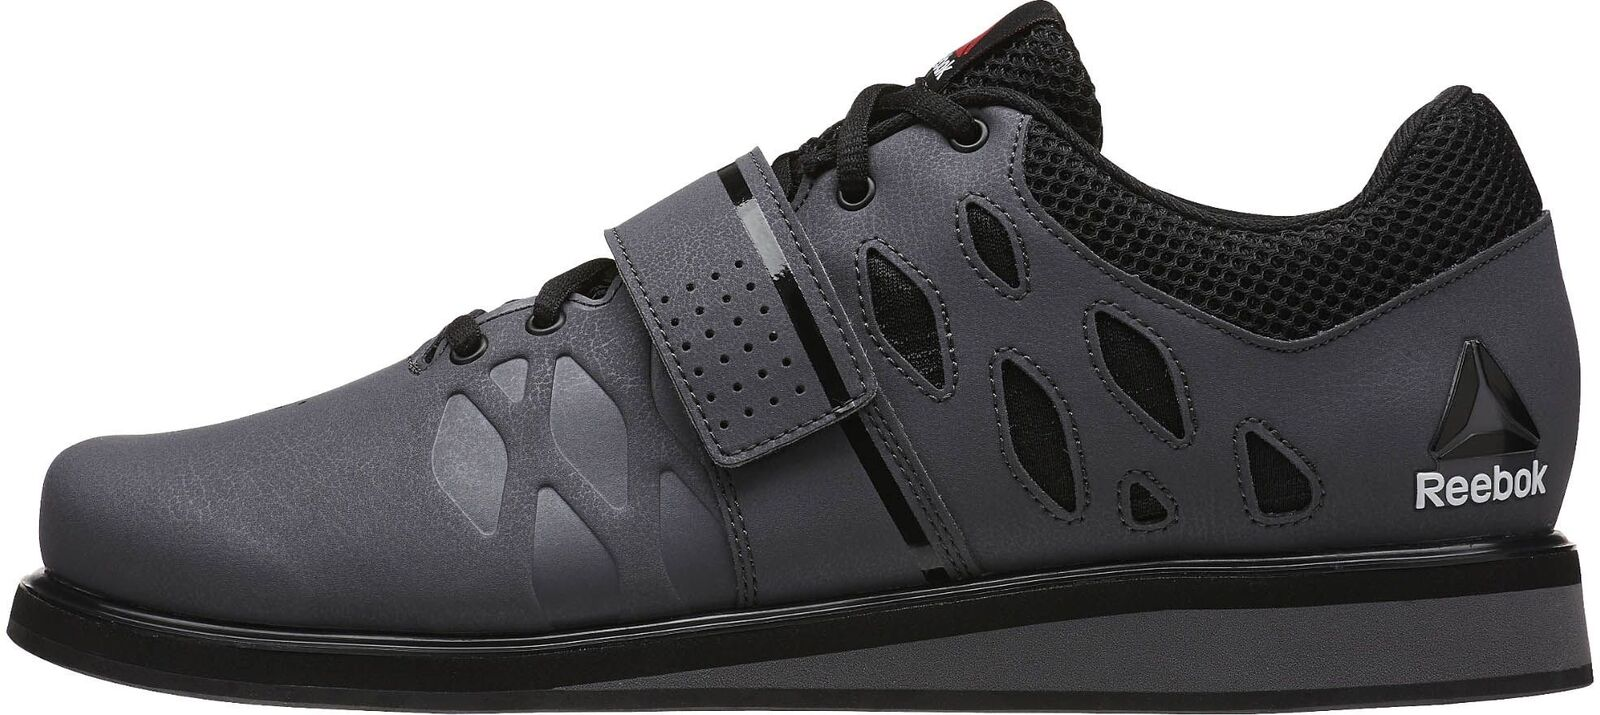 Reebok Lifter PR Mens Weightlifting zapatos gris Bodybuilding botas Gym Training